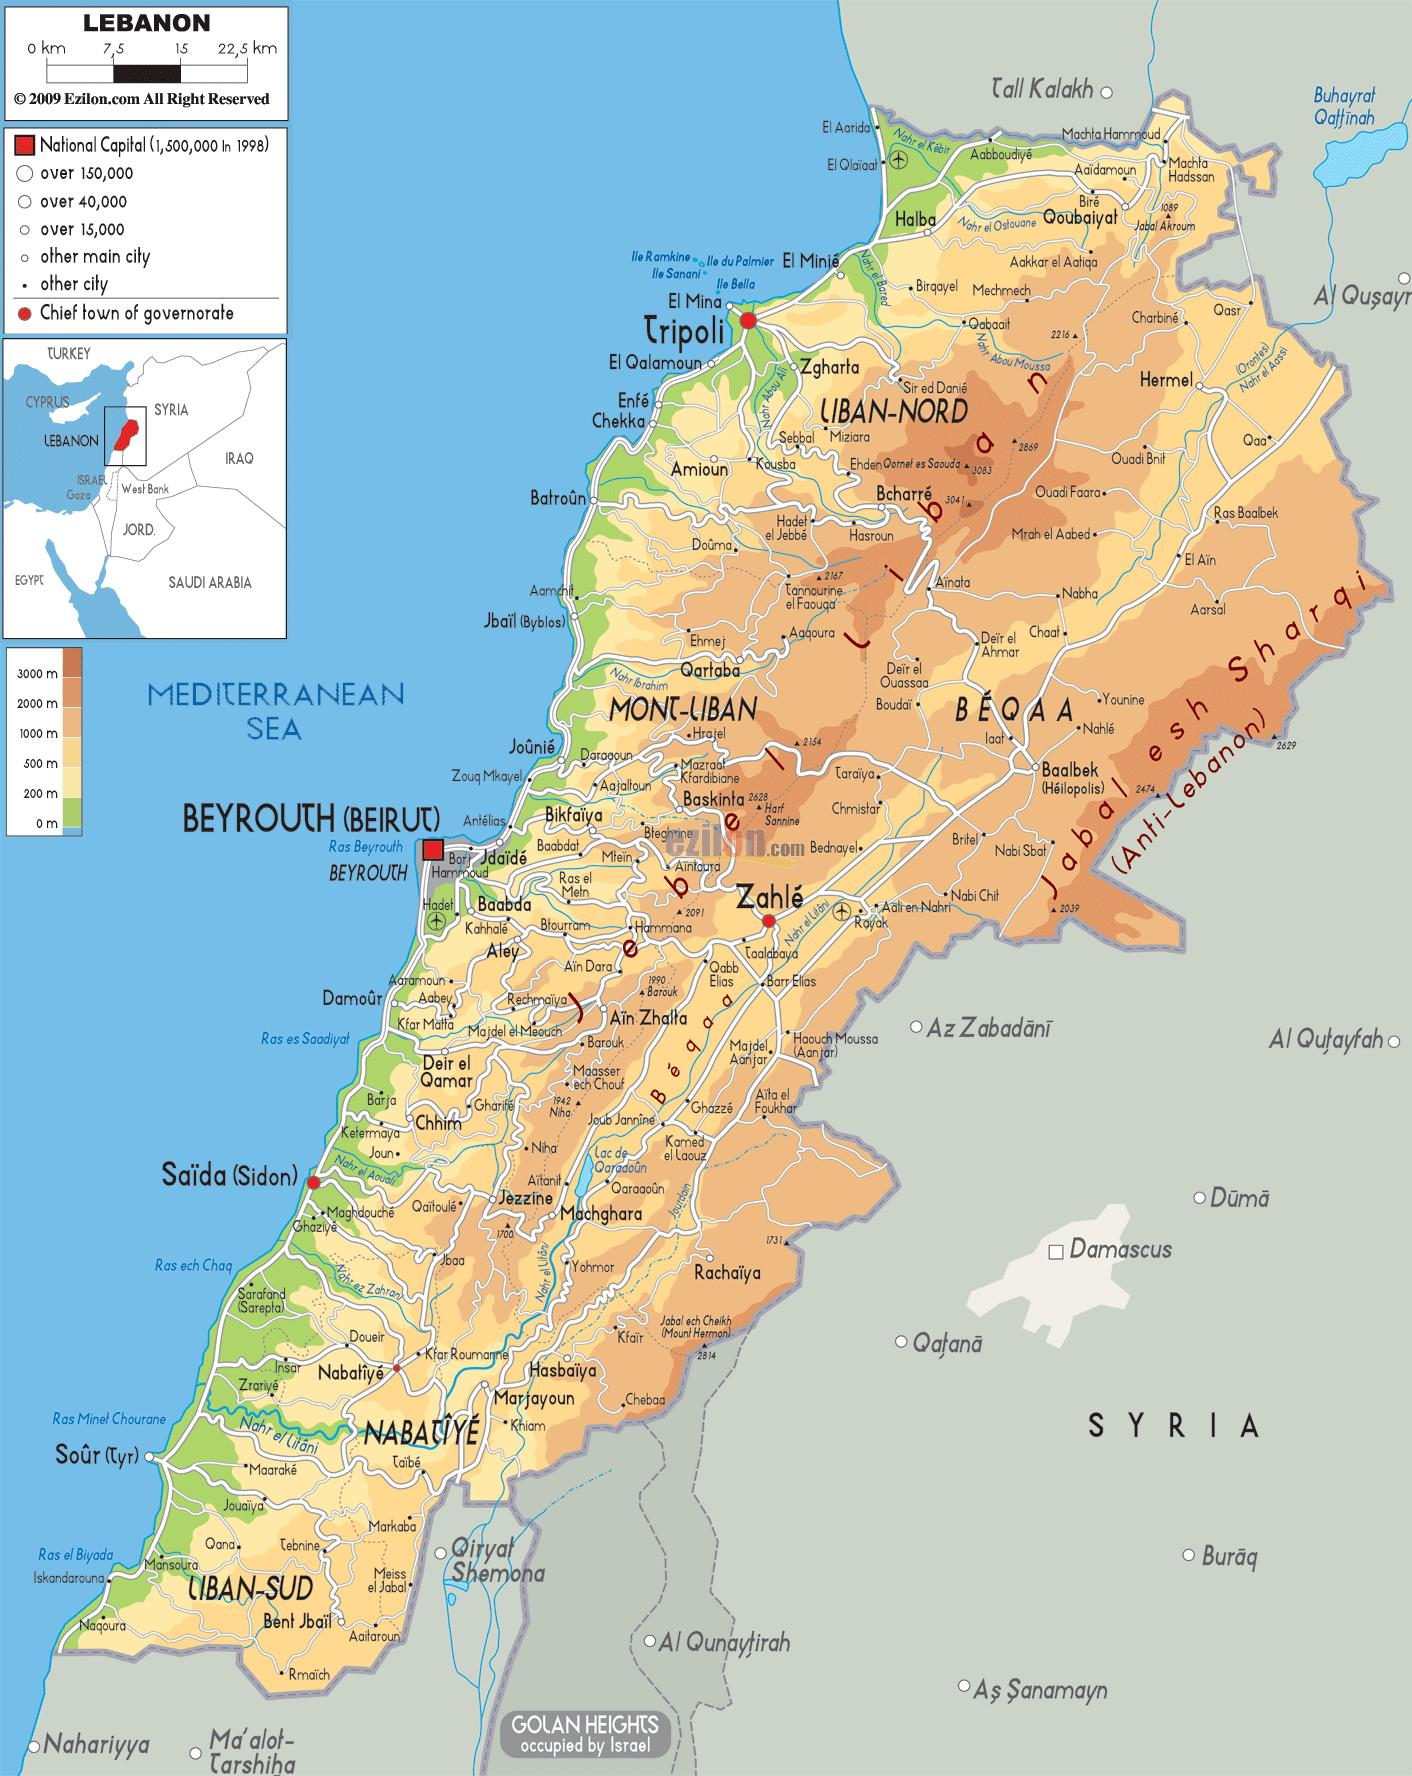 Cartina Fisica Del Libano.Libano Mappa Fisica Mappa Del Libano Fisica Asia Occidentale Asia